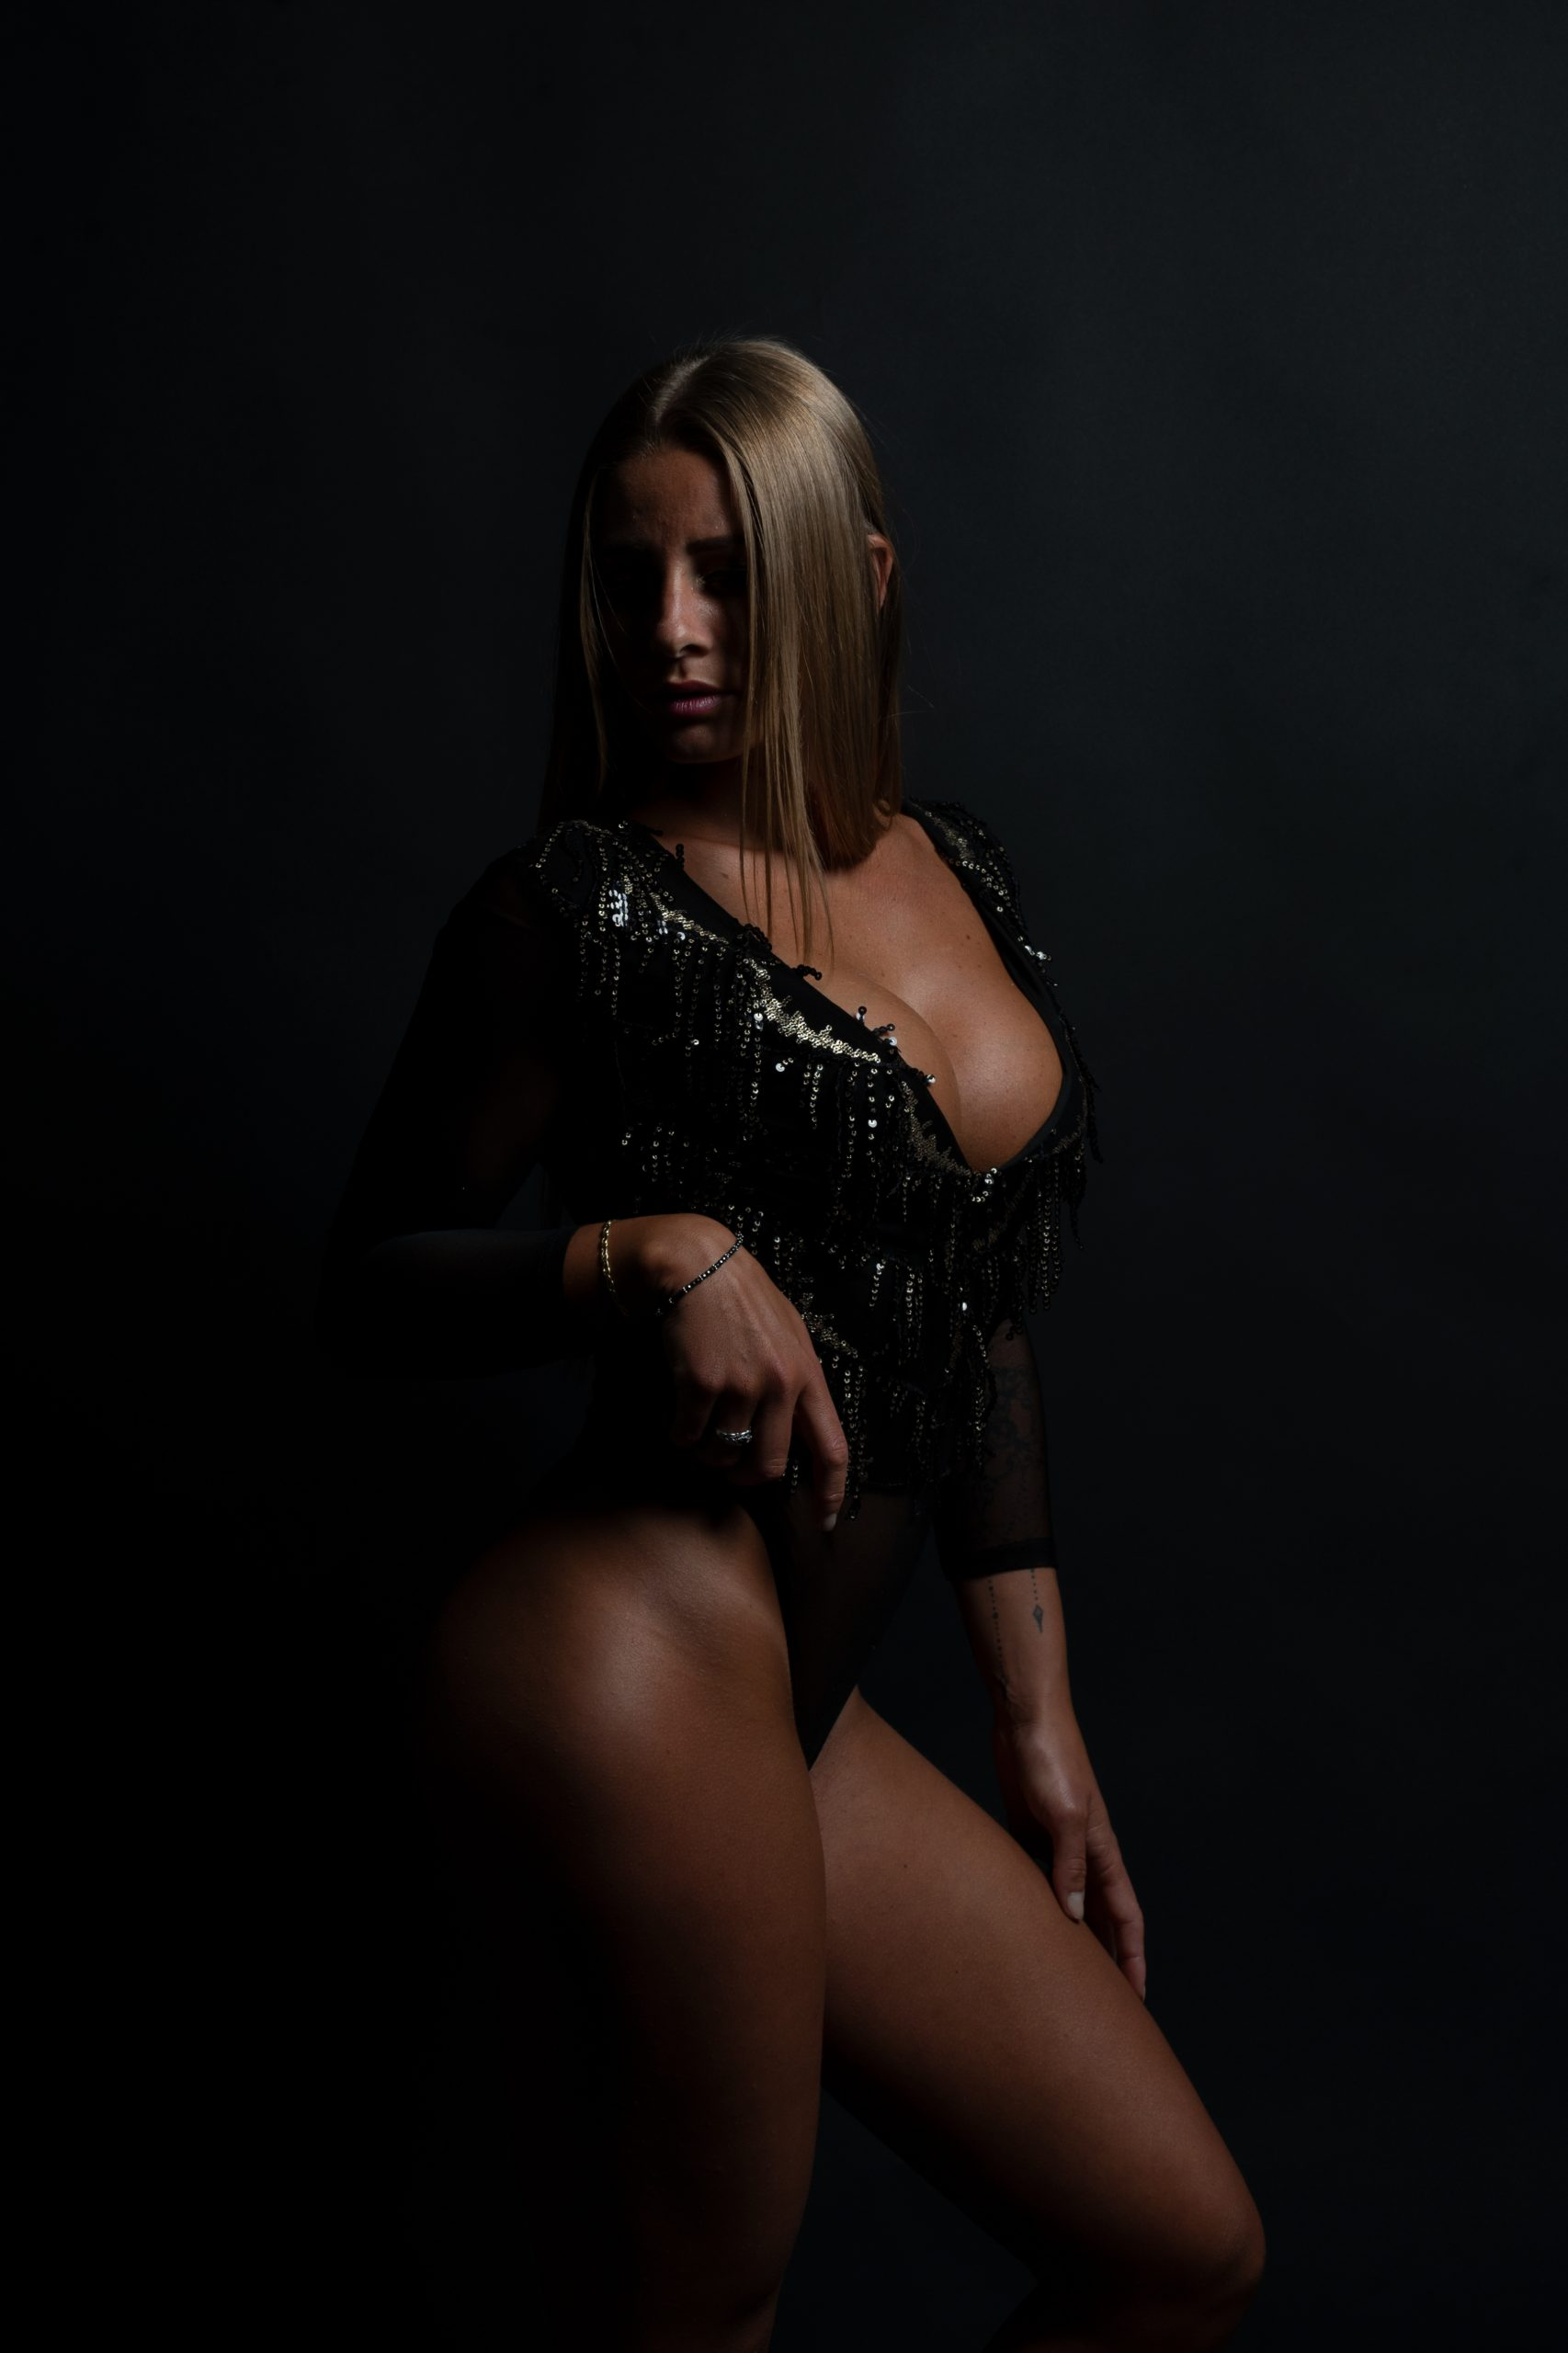 Valentina_Zamperoni_051-1